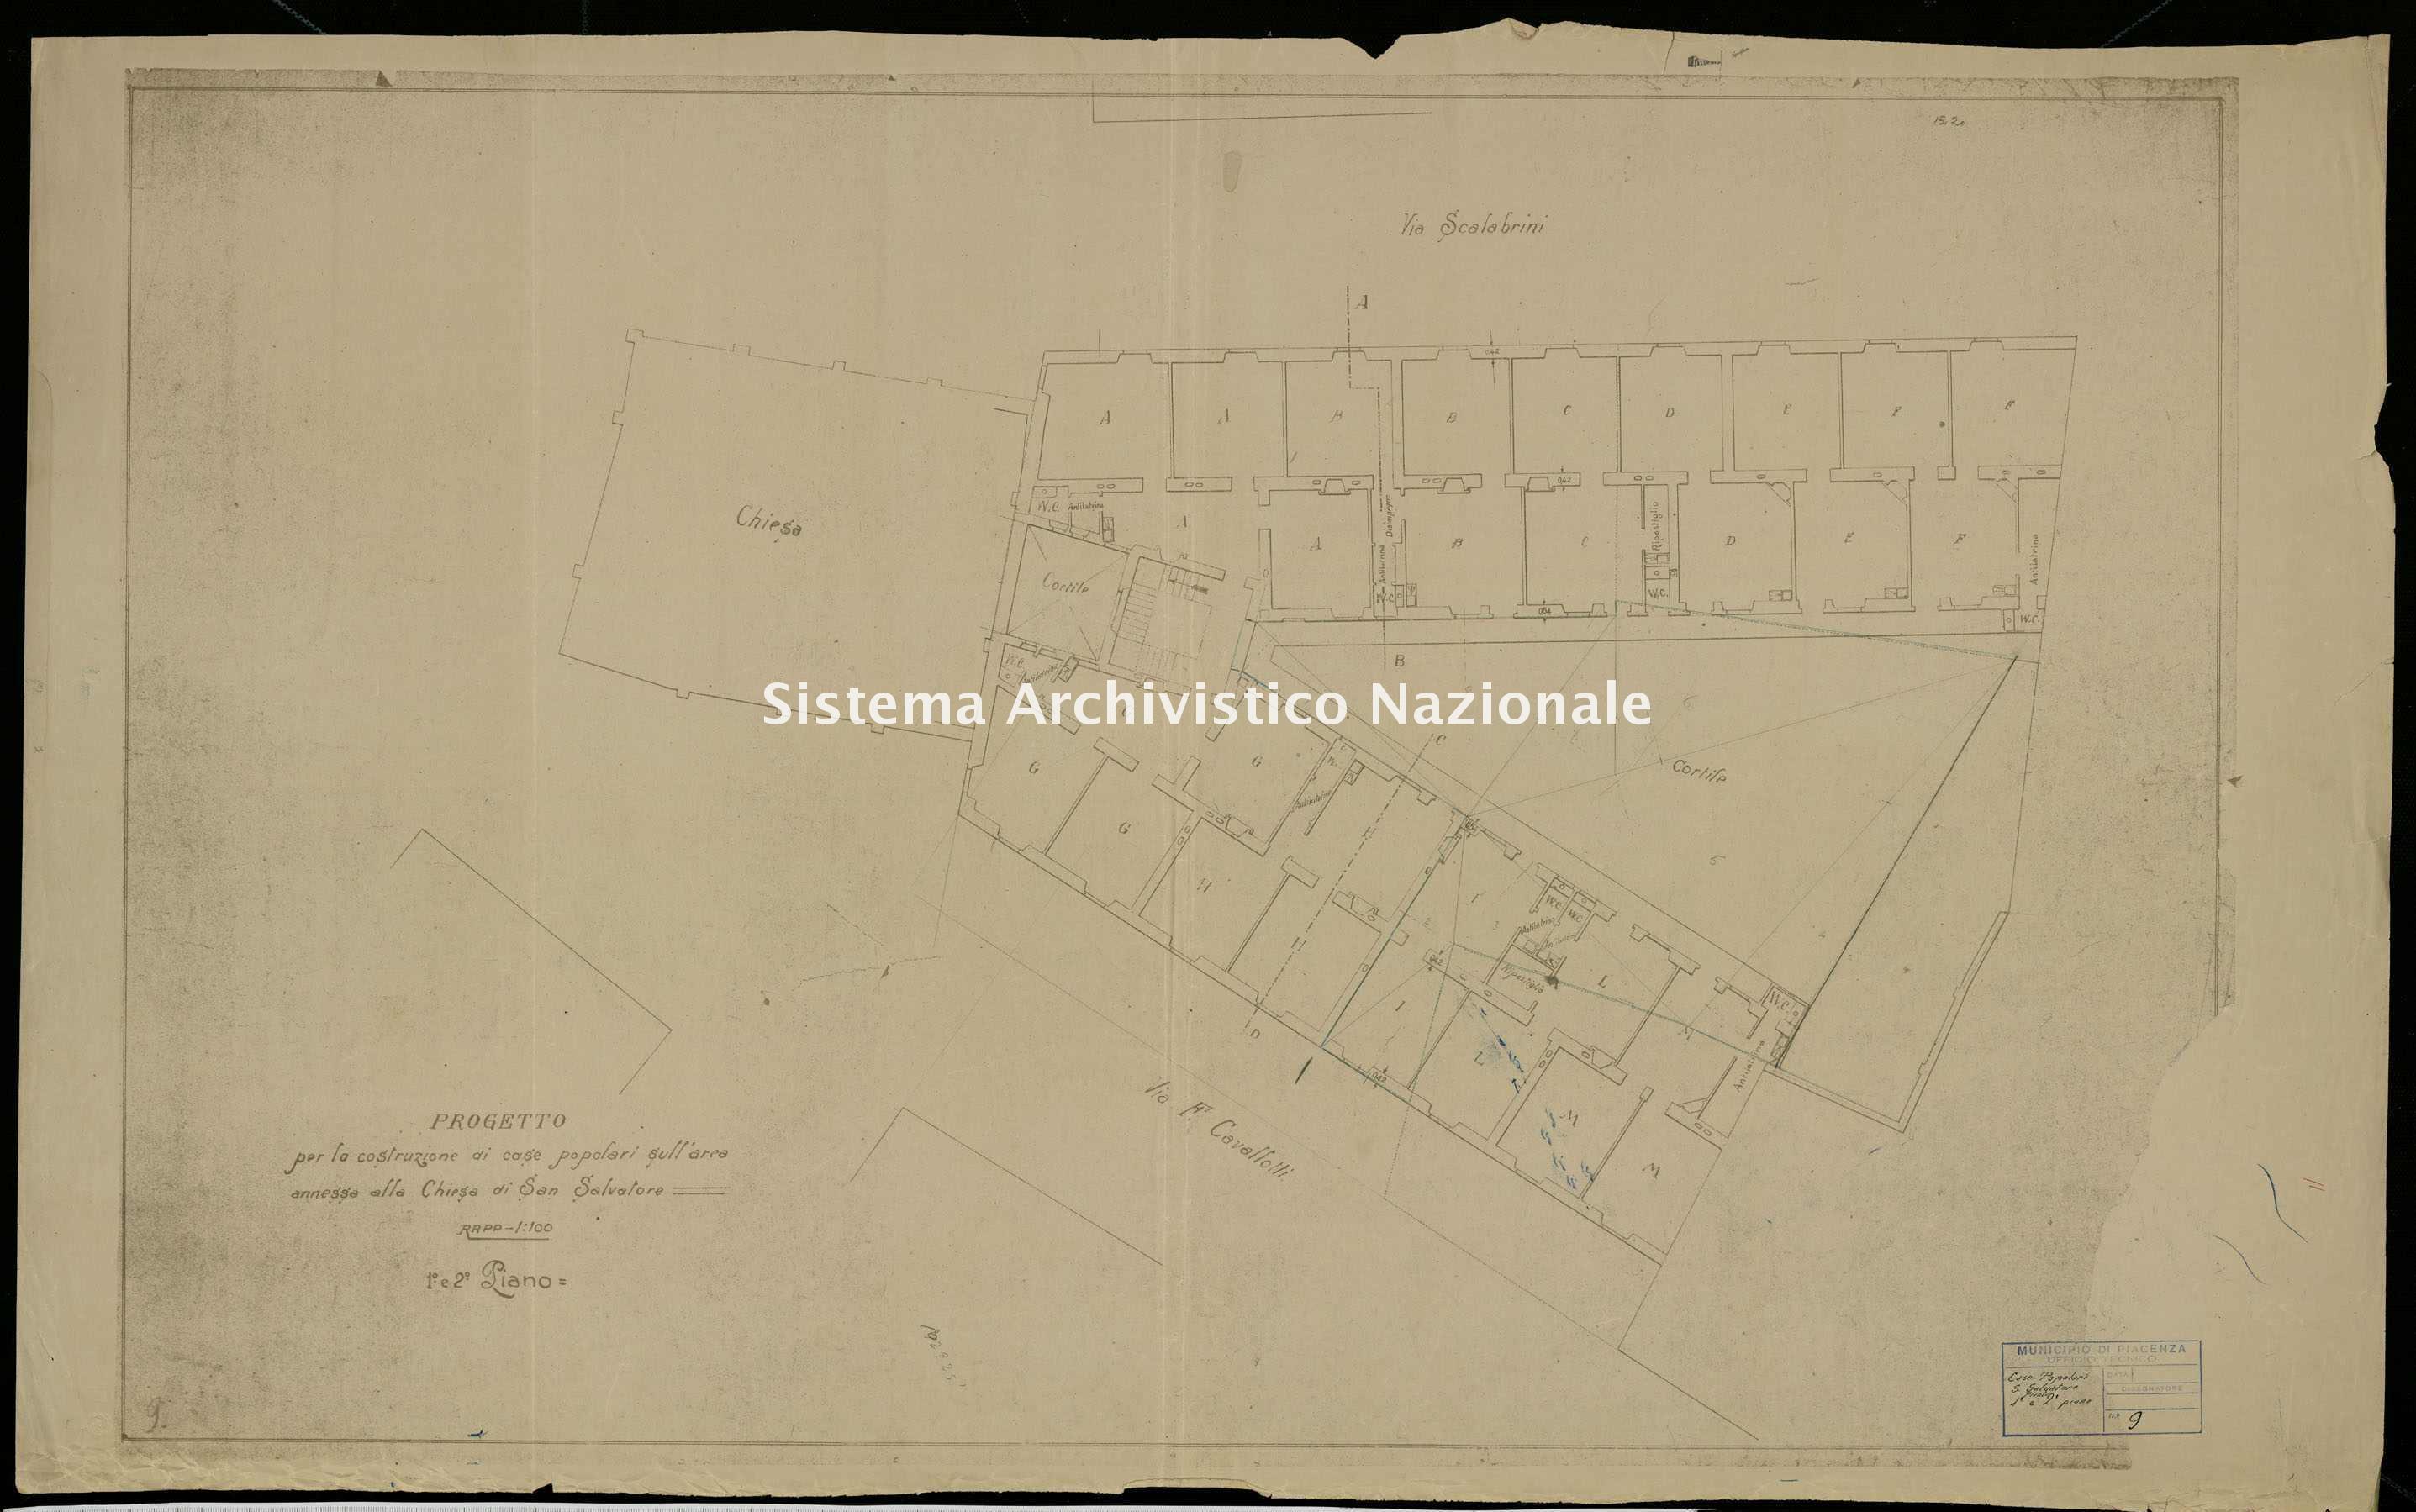 ASPC Mappe, stampe e disegni, n. 5136